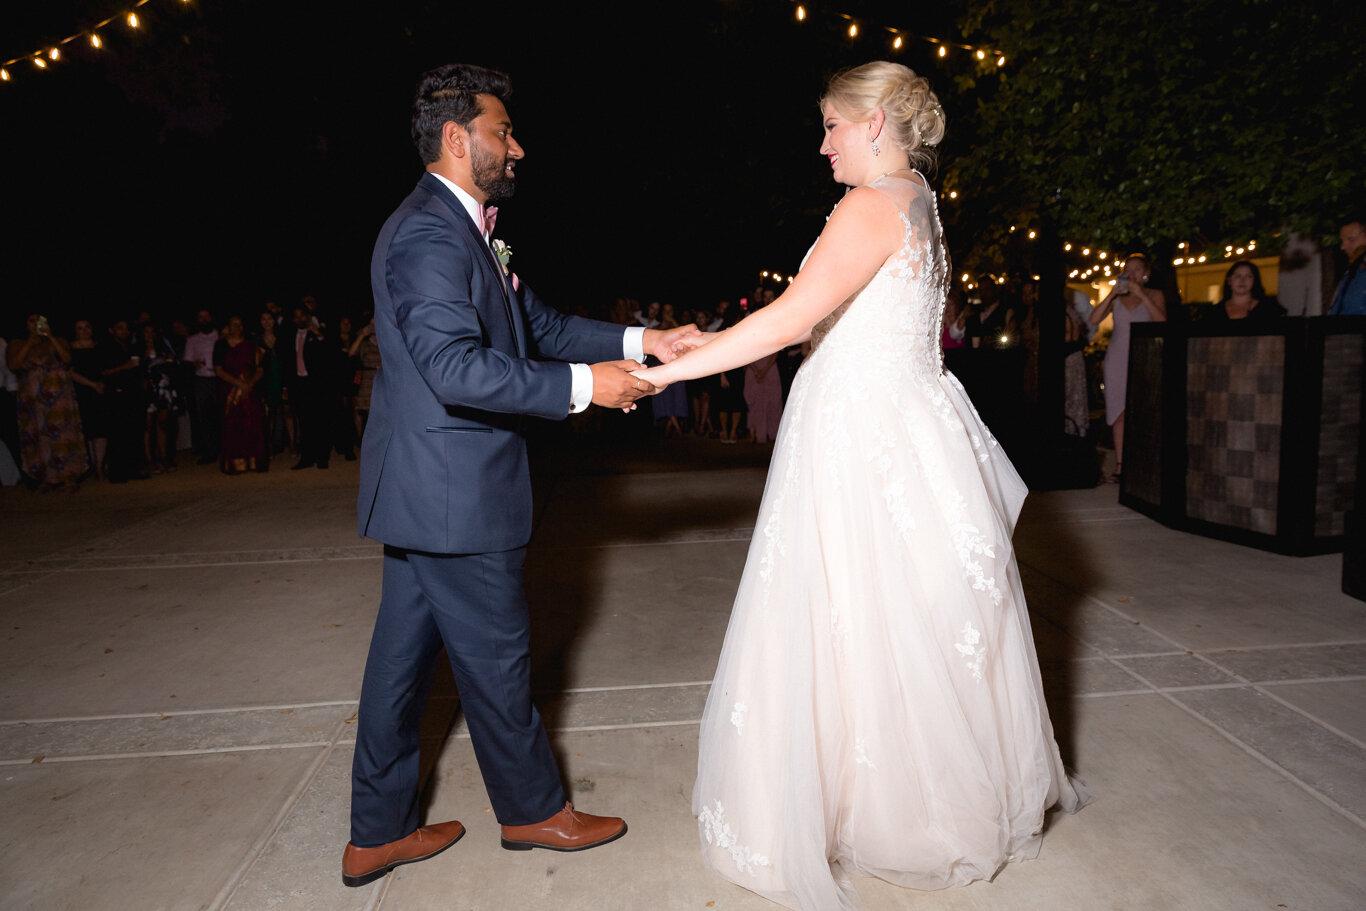 2019.08.24_Emily-Ashir-Wedding-at-the-Maples-6405.jpg